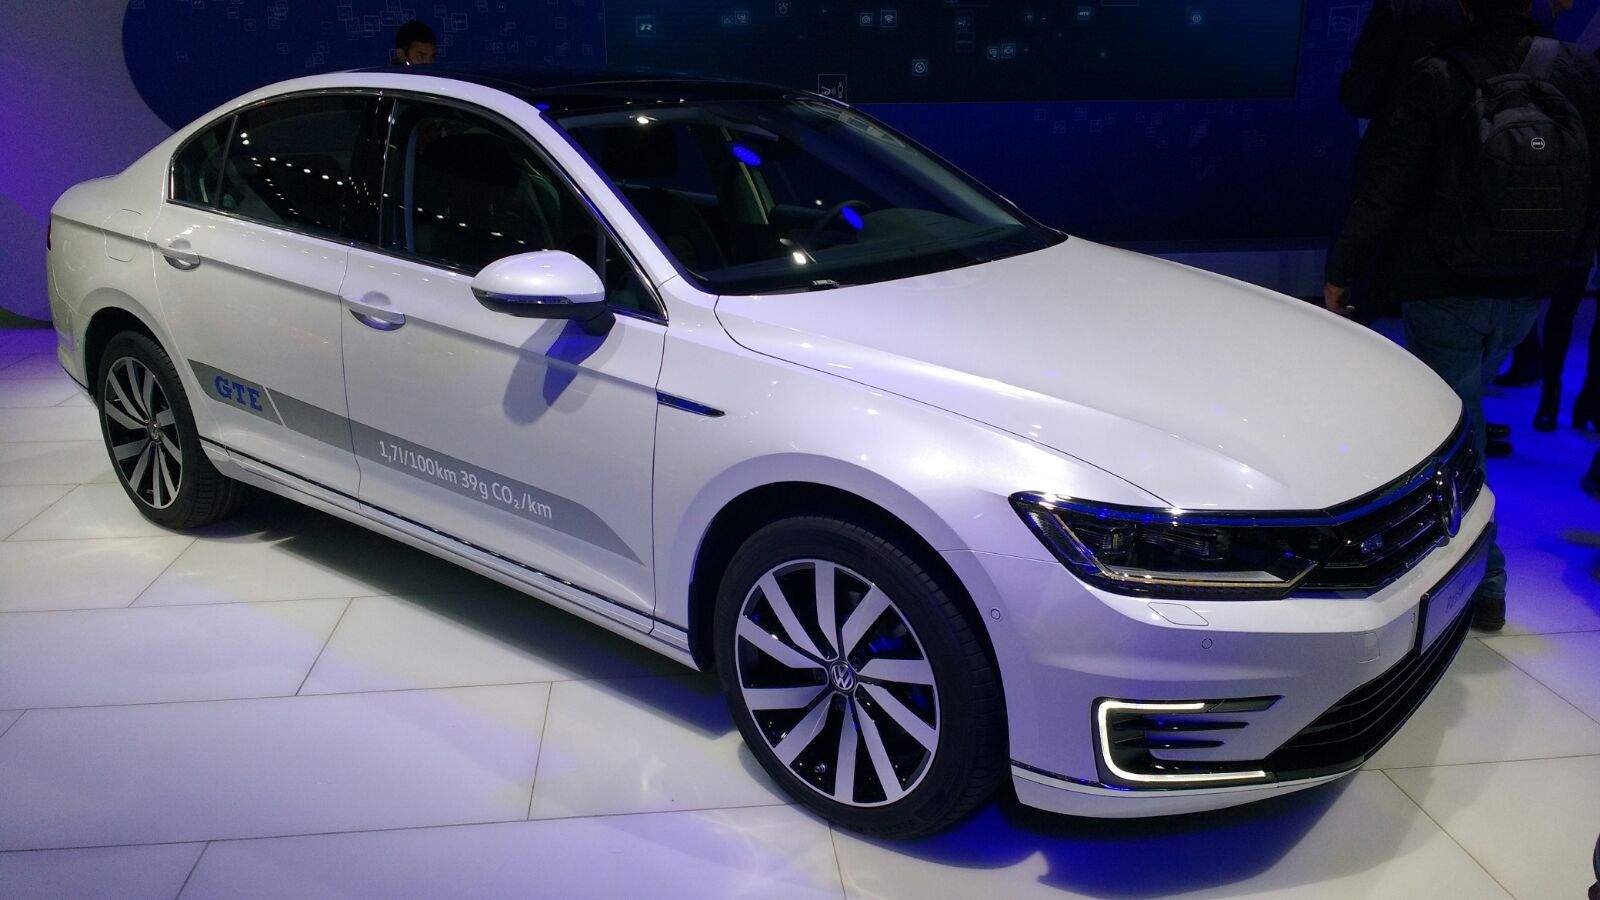 Volkswagen passat review 2017 autocar - India Bound Volkswagen Passat Gte Plug In Hybrid Showcased At The Auto Expo Autocar India